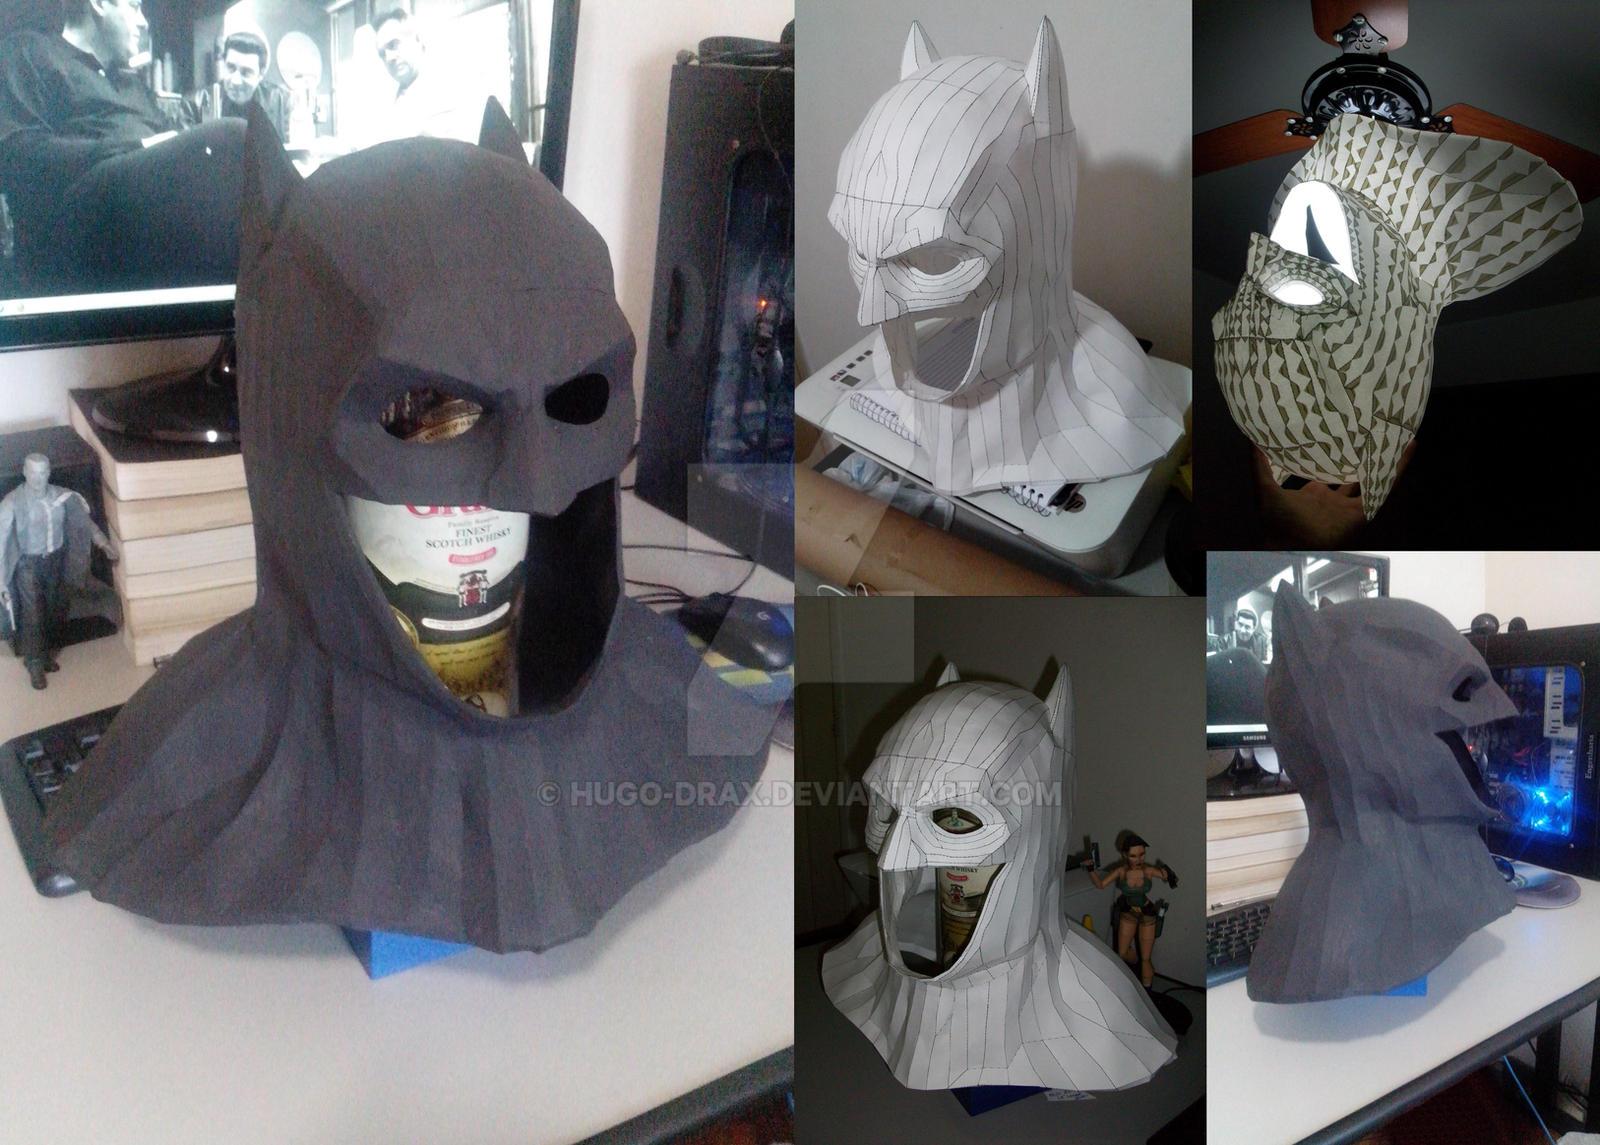 bvs dawn of justice batman papercraft cowl by hugo drax on deviantart